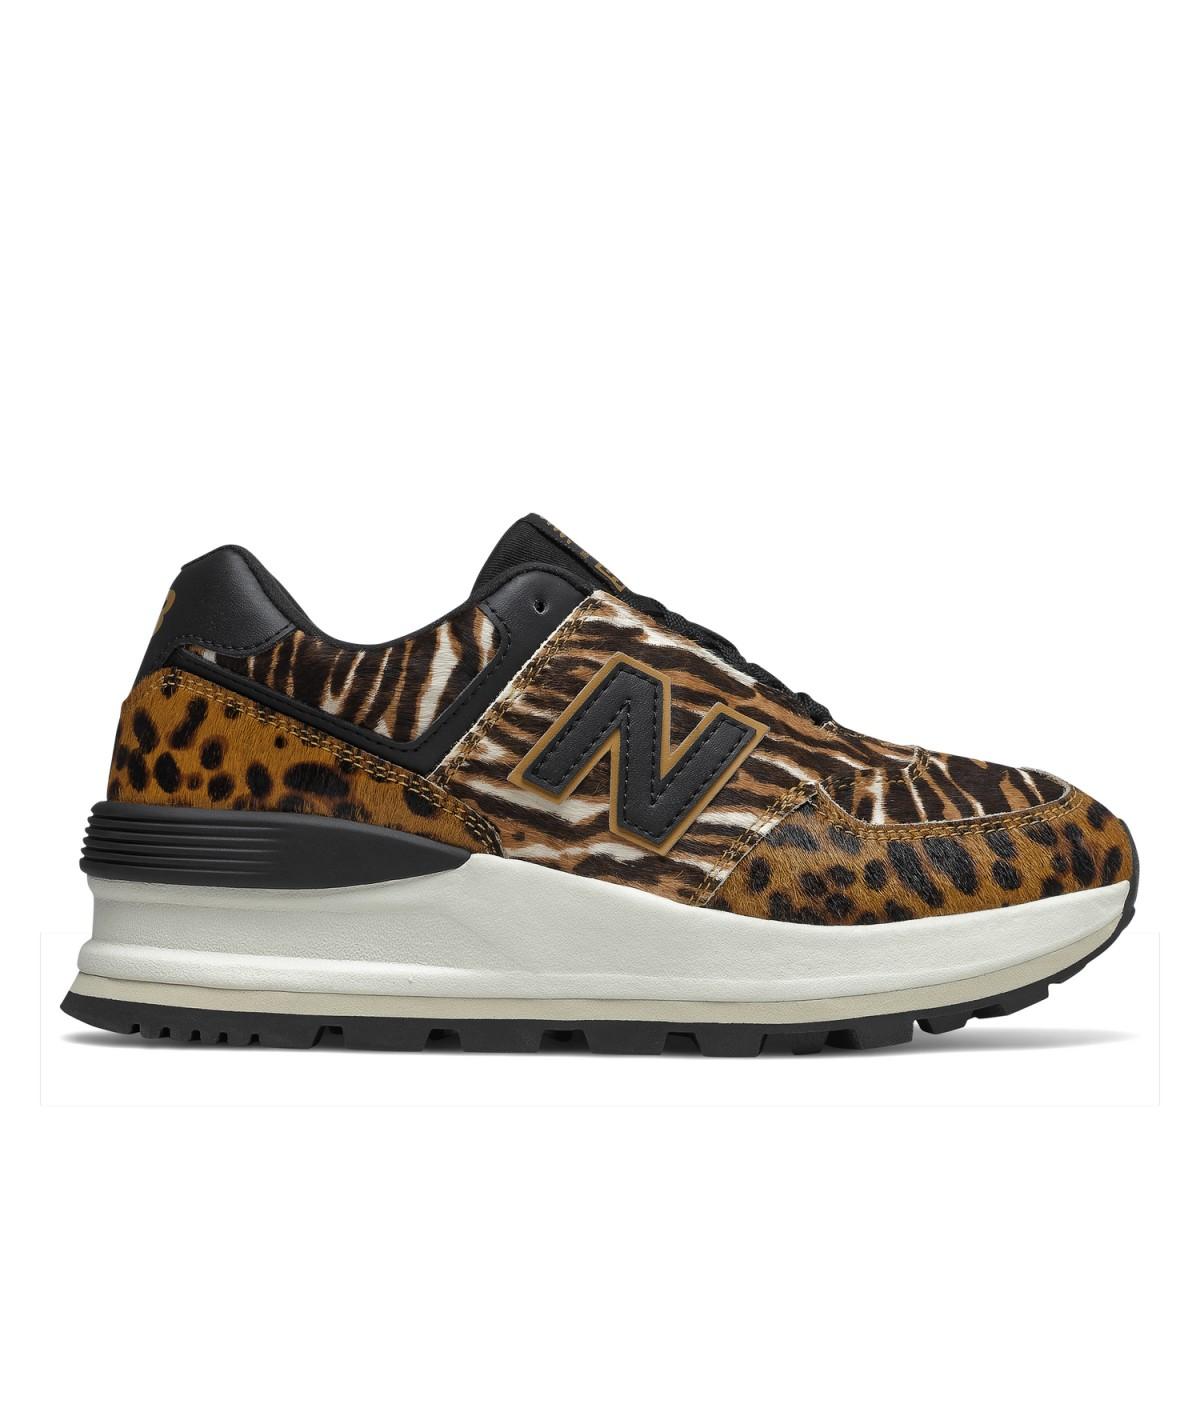 New Balance 574 CZB sneaker...